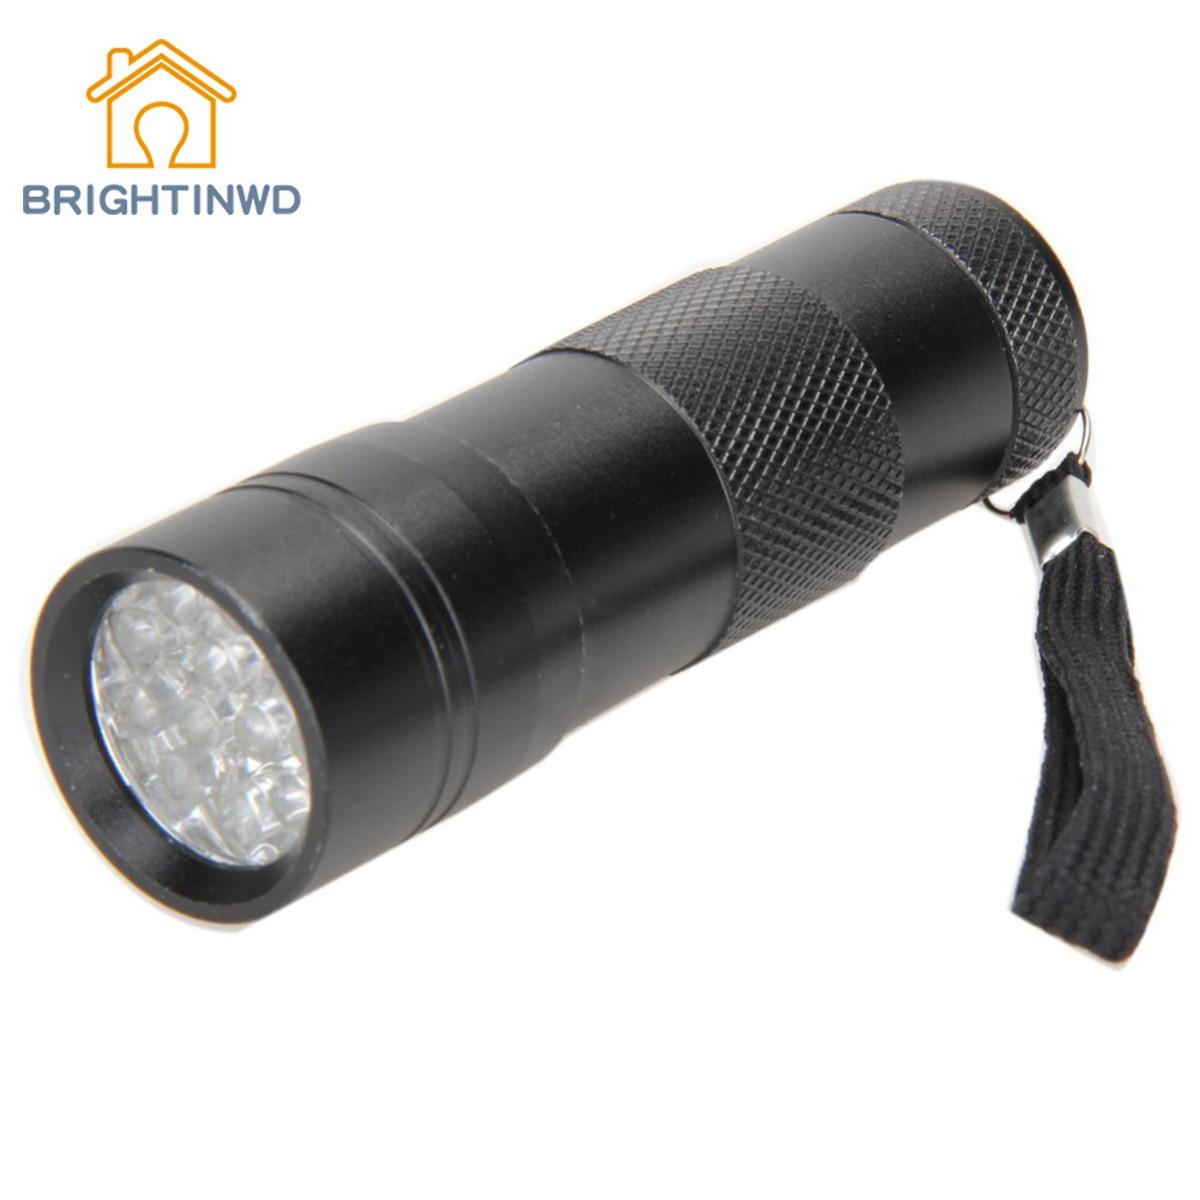 BRIGHTINWD 12 LED Mini UV Money Detector Ultra Violet Flashlight Torch Light Lamp ...